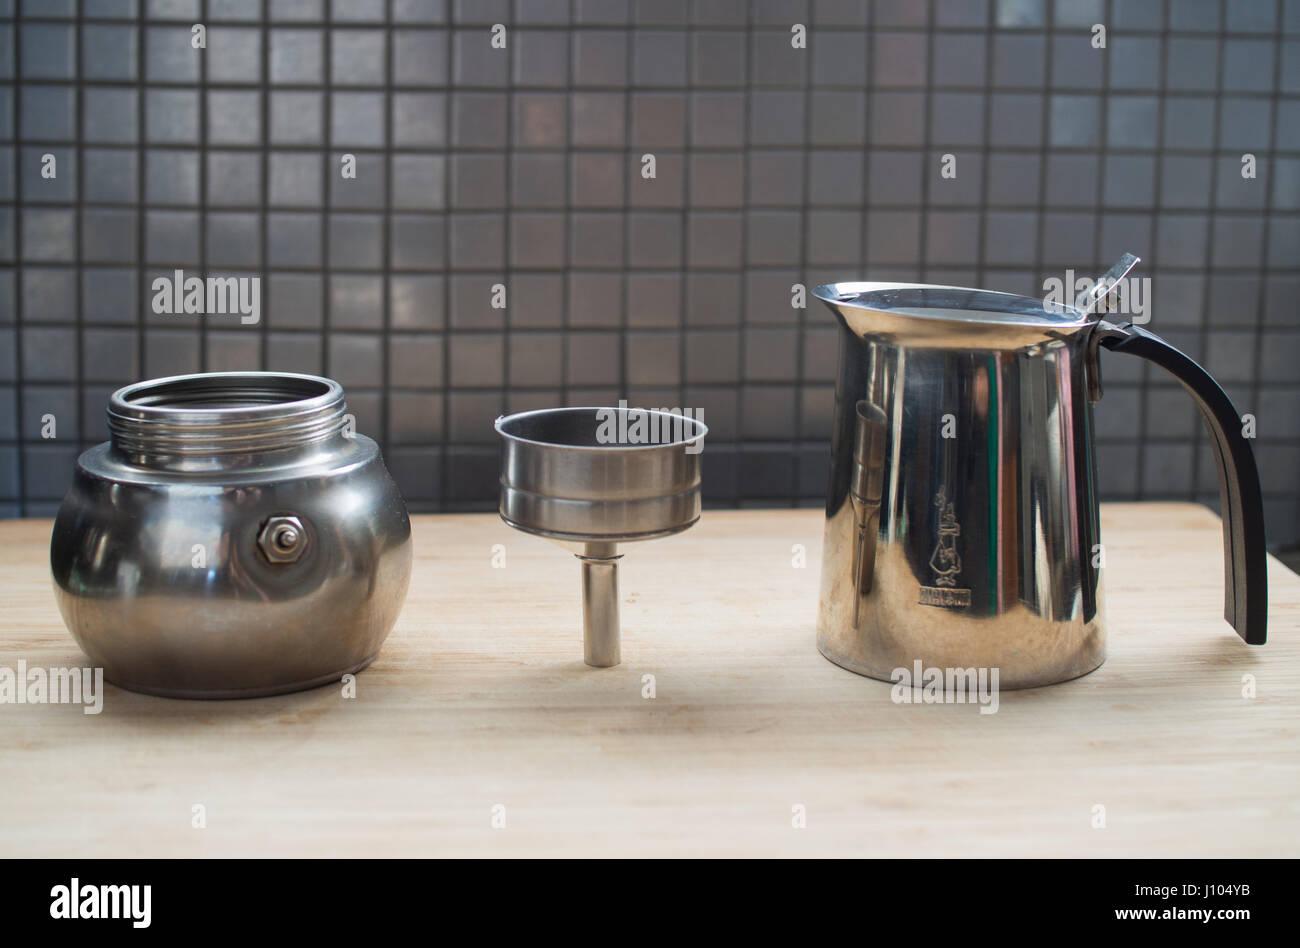 Using a moka pot to make espresso on a stove - Stock Image